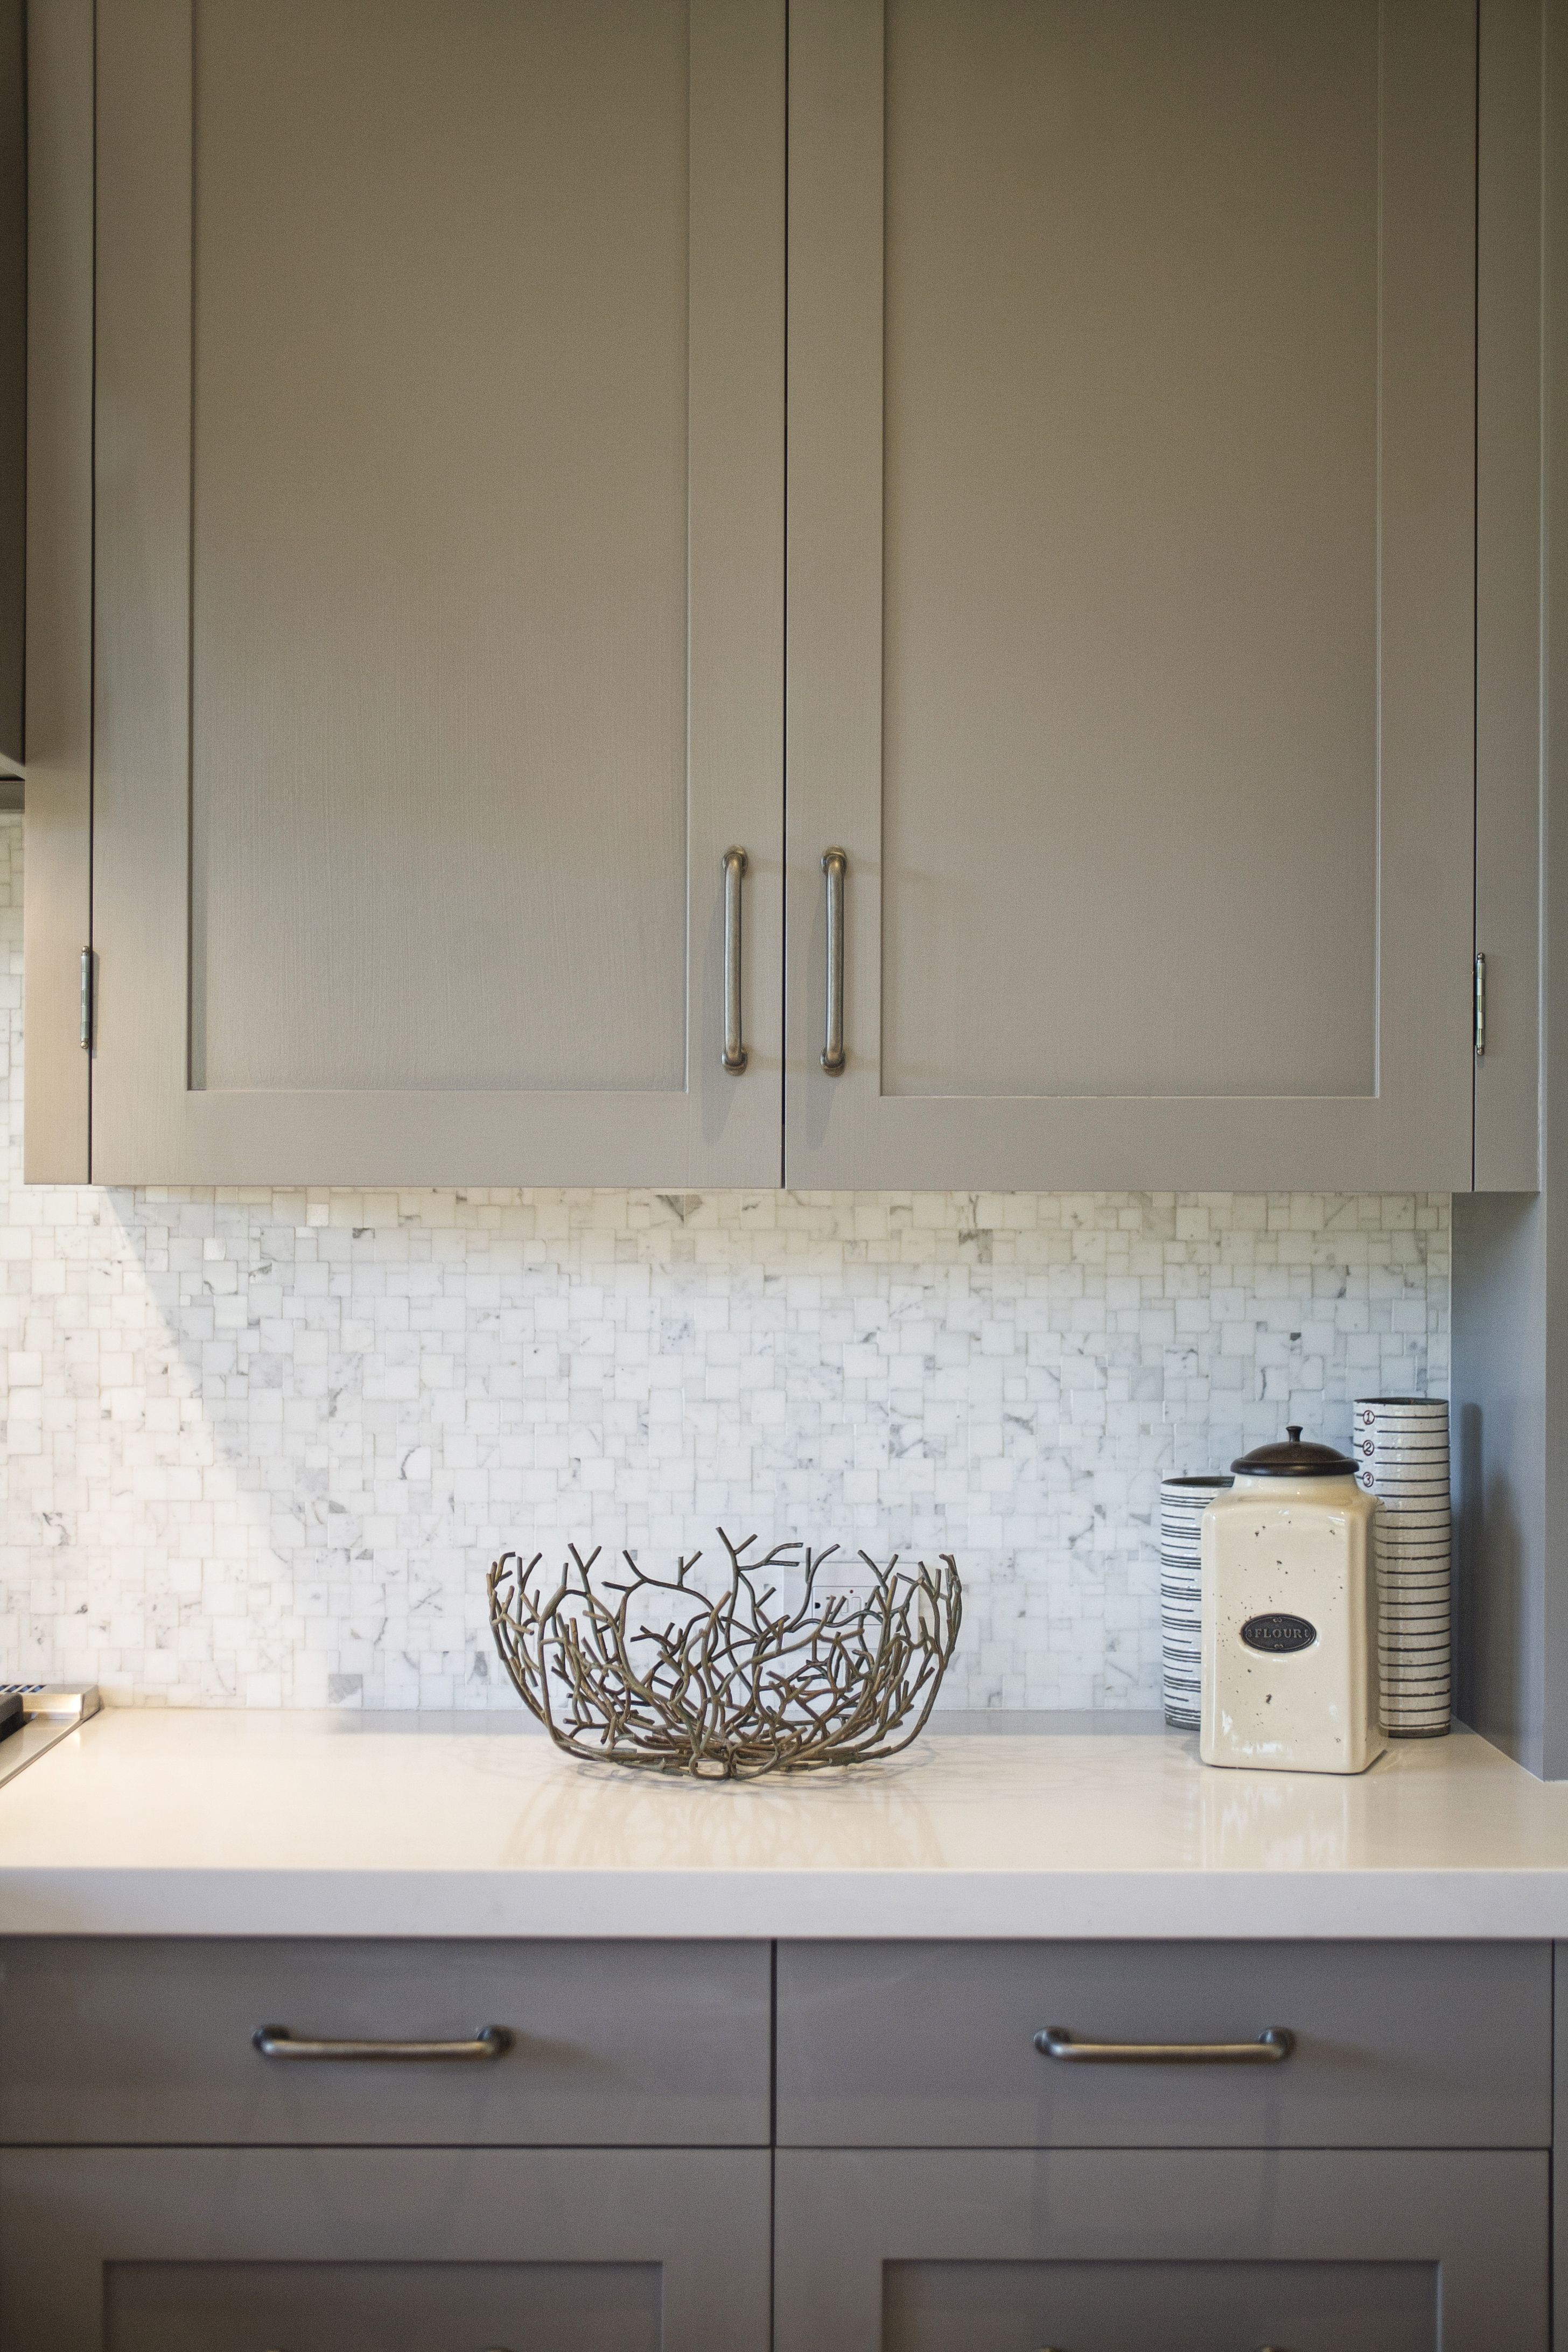 Urban farmhouse kitchen cabinets are benjamin moore for Urban farmhouse kitchen